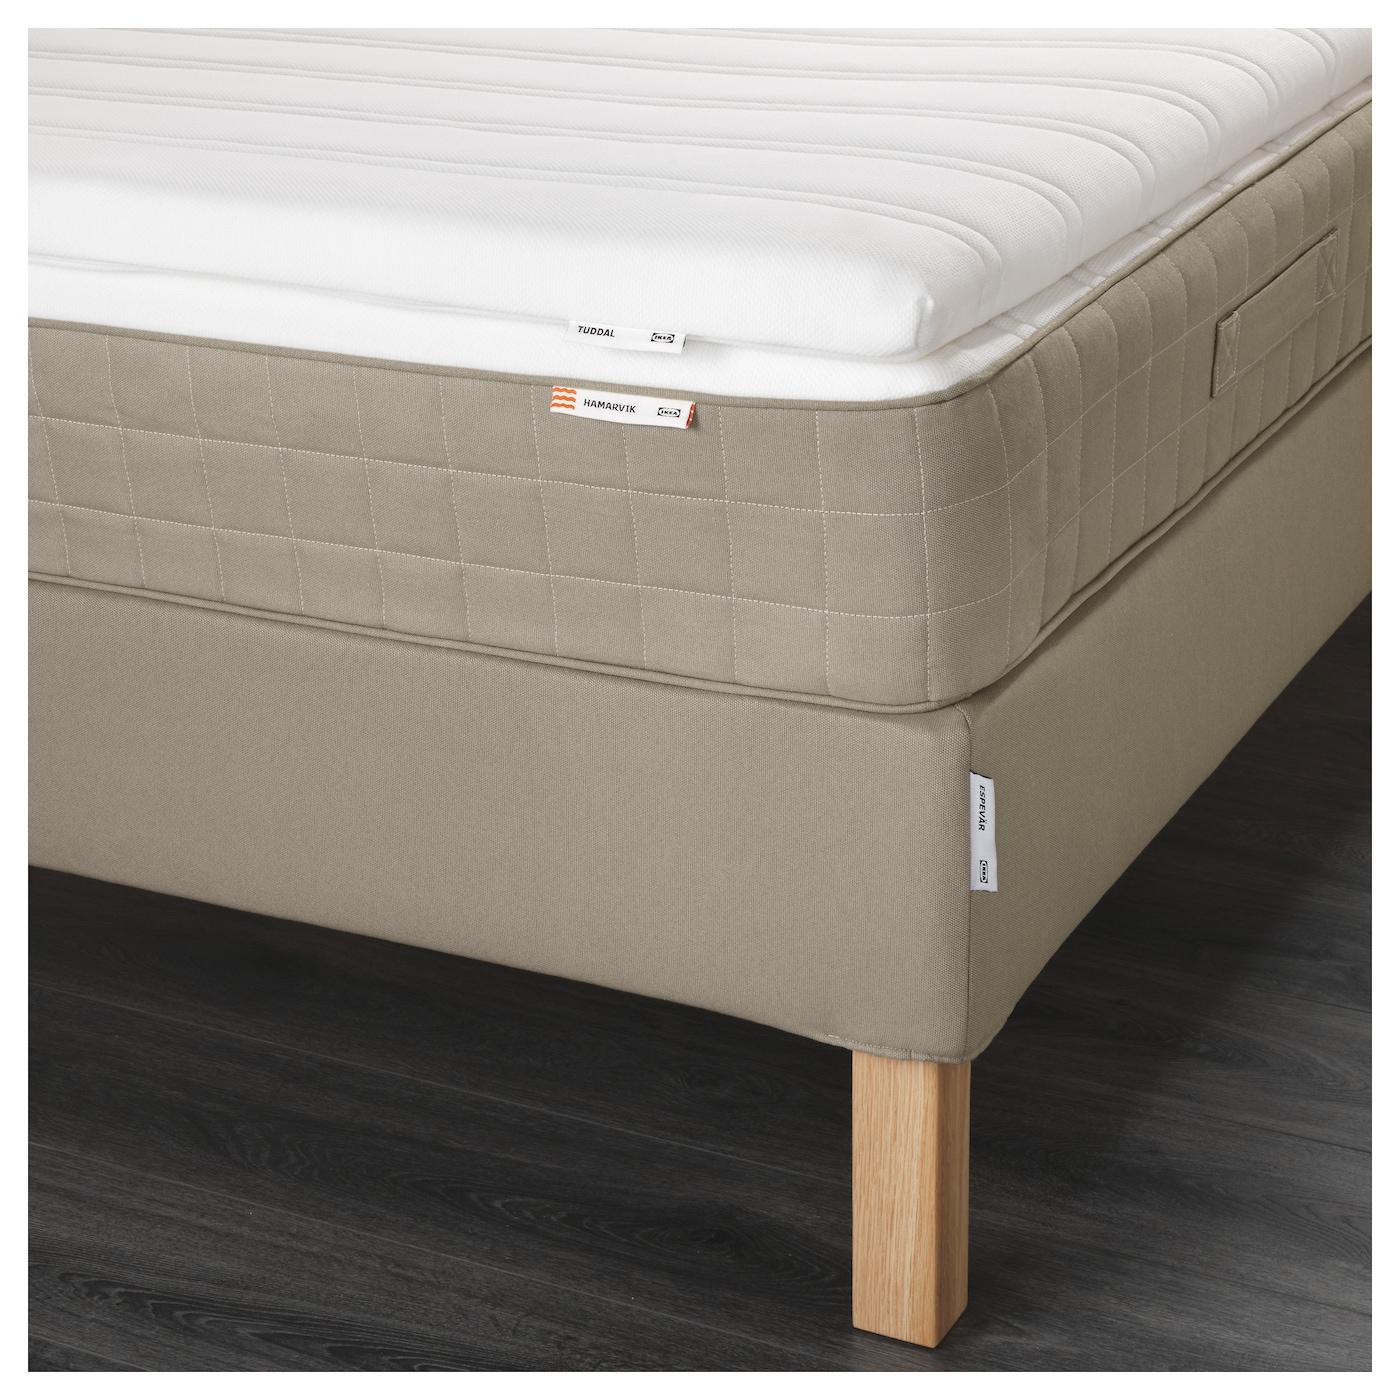 espev r lit sommier hamarvik ferme mi ferme tuddal beige fonc 180x200 cm ikea. Black Bedroom Furniture Sets. Home Design Ideas